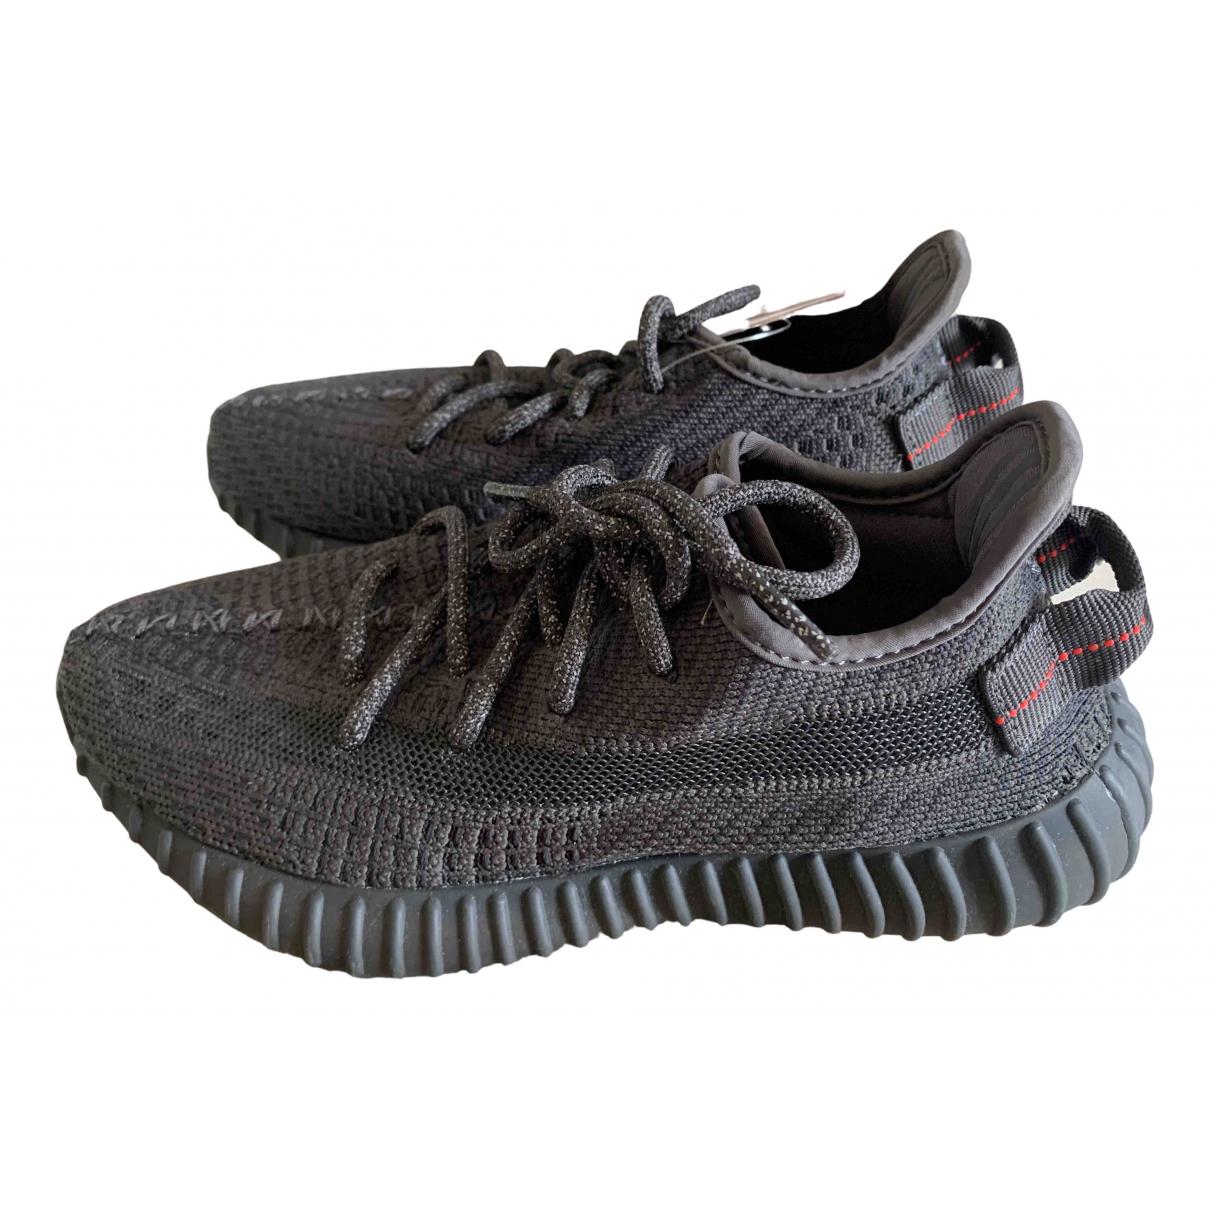 Yeezy X Adidas Boost 350 V2 Sneakers in  Schwarz Leinen